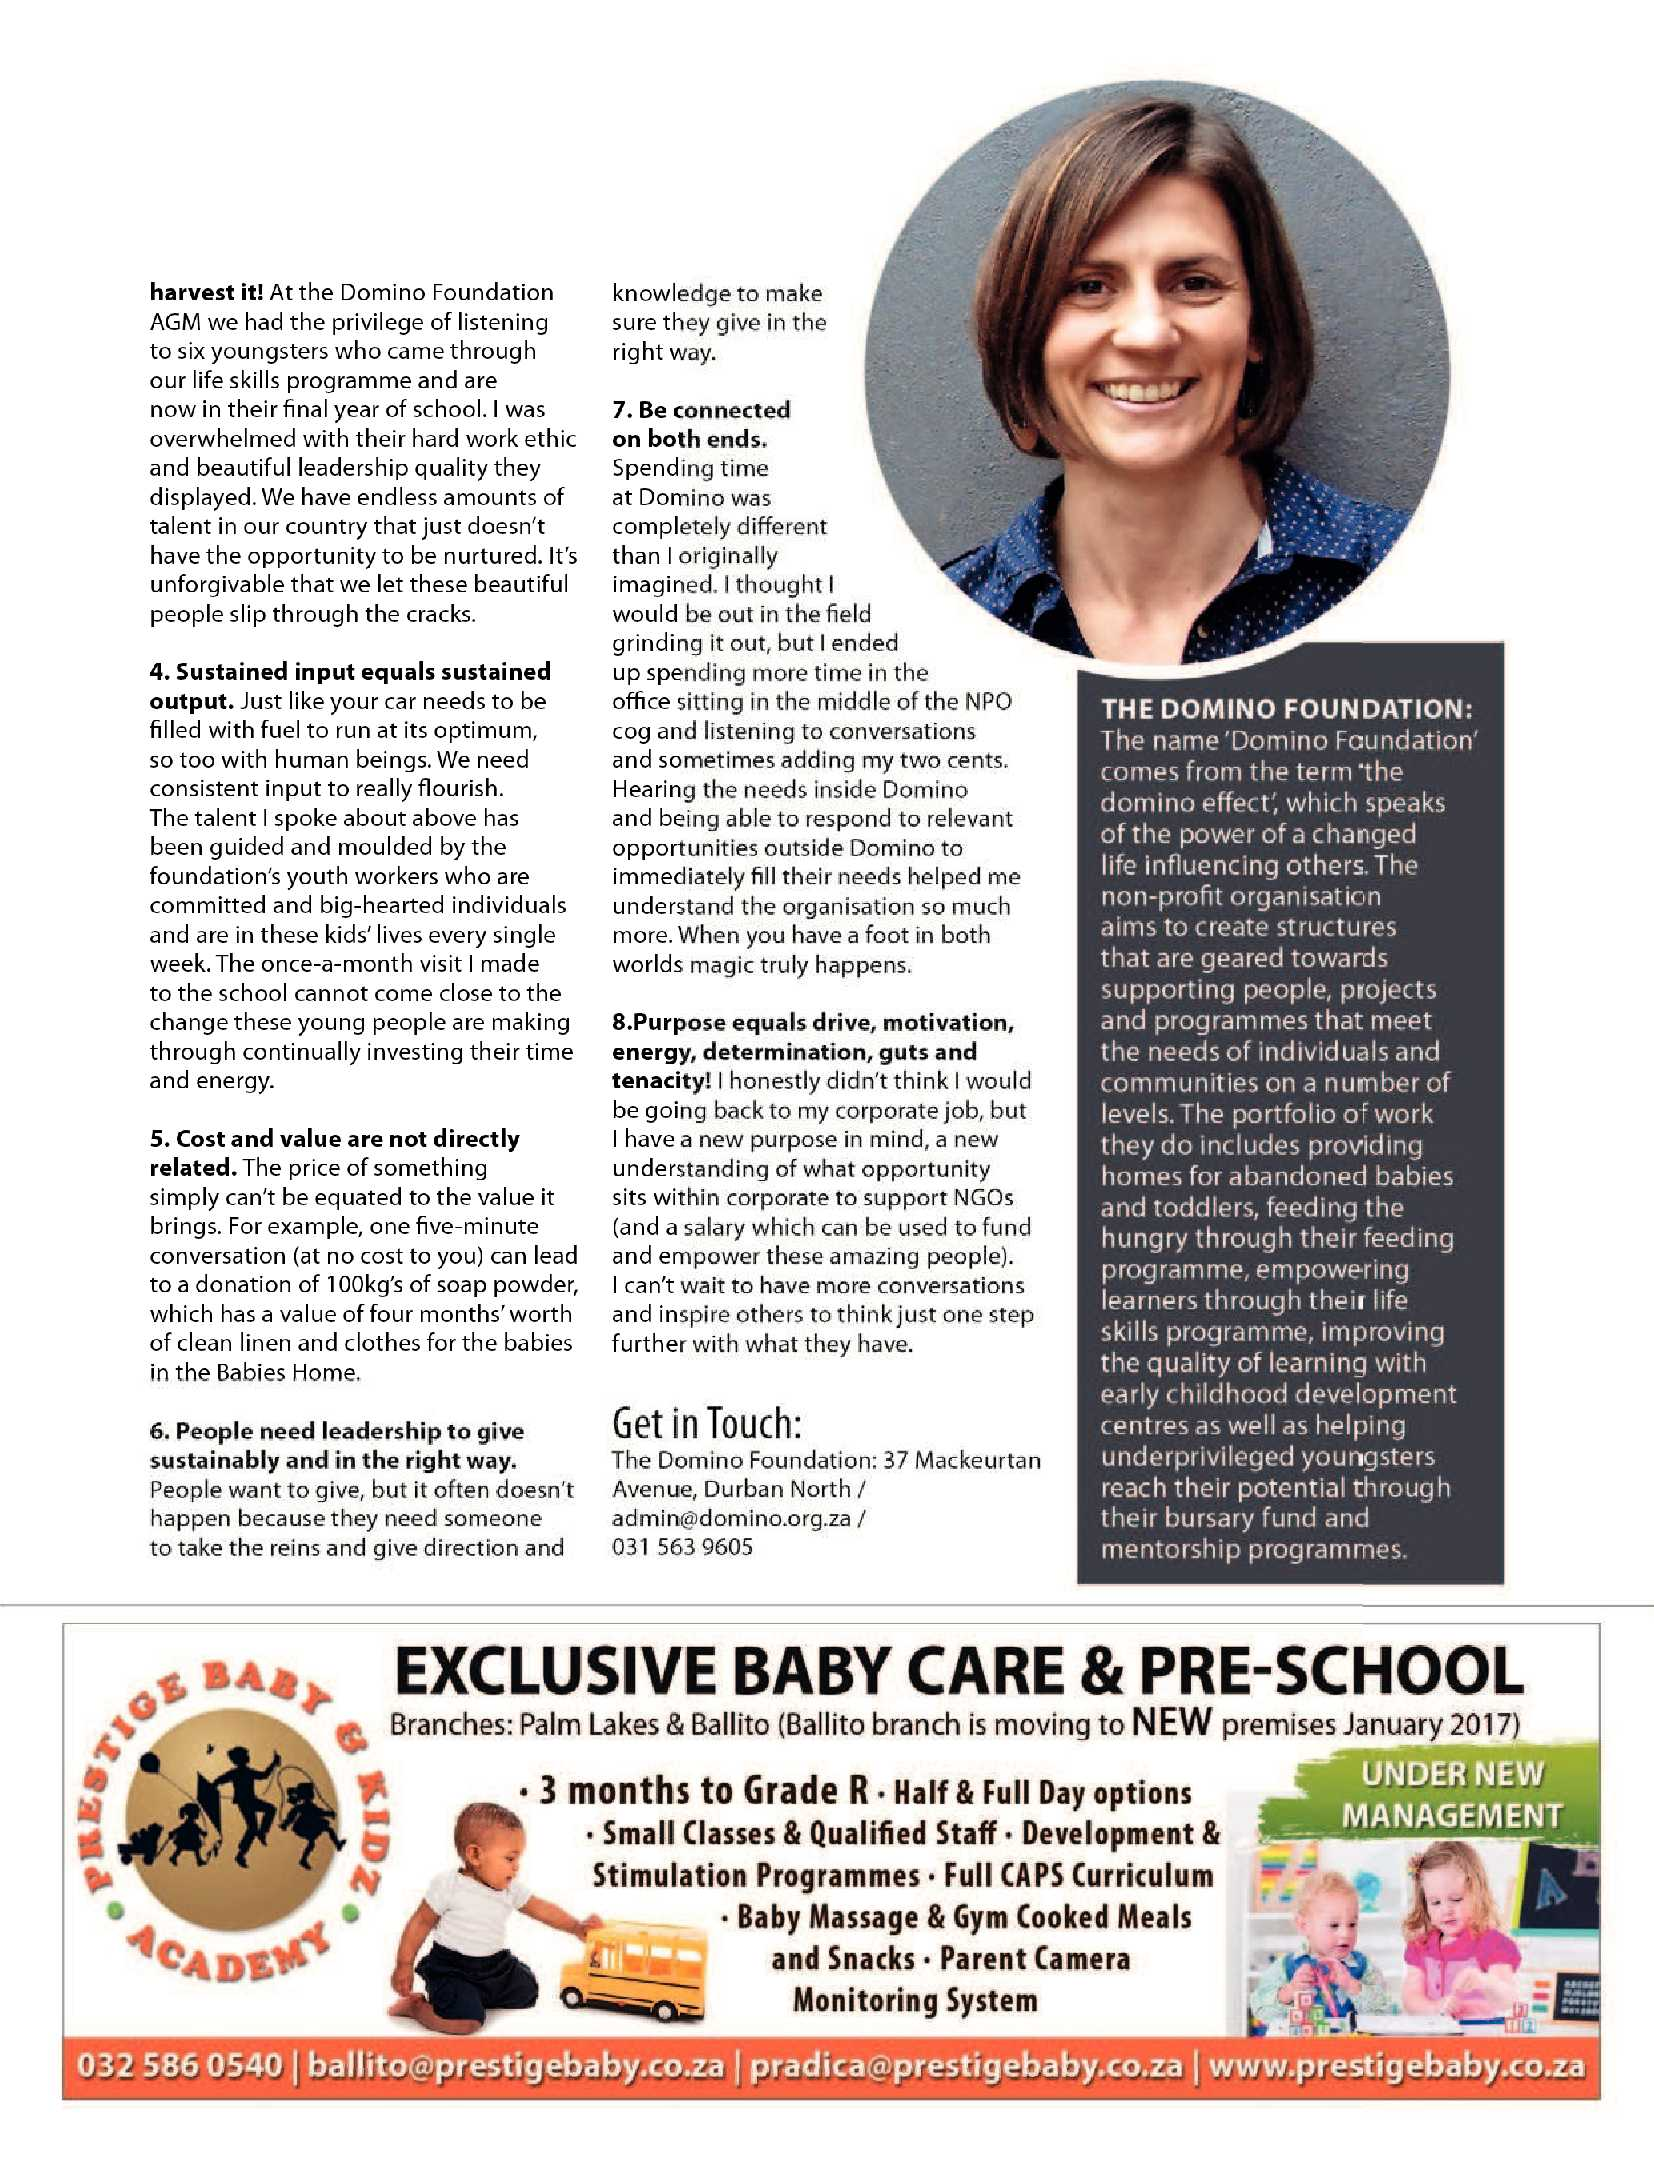 get-magazine-ballitoumhlanga-december-2016-january-2017-epapers-page-31